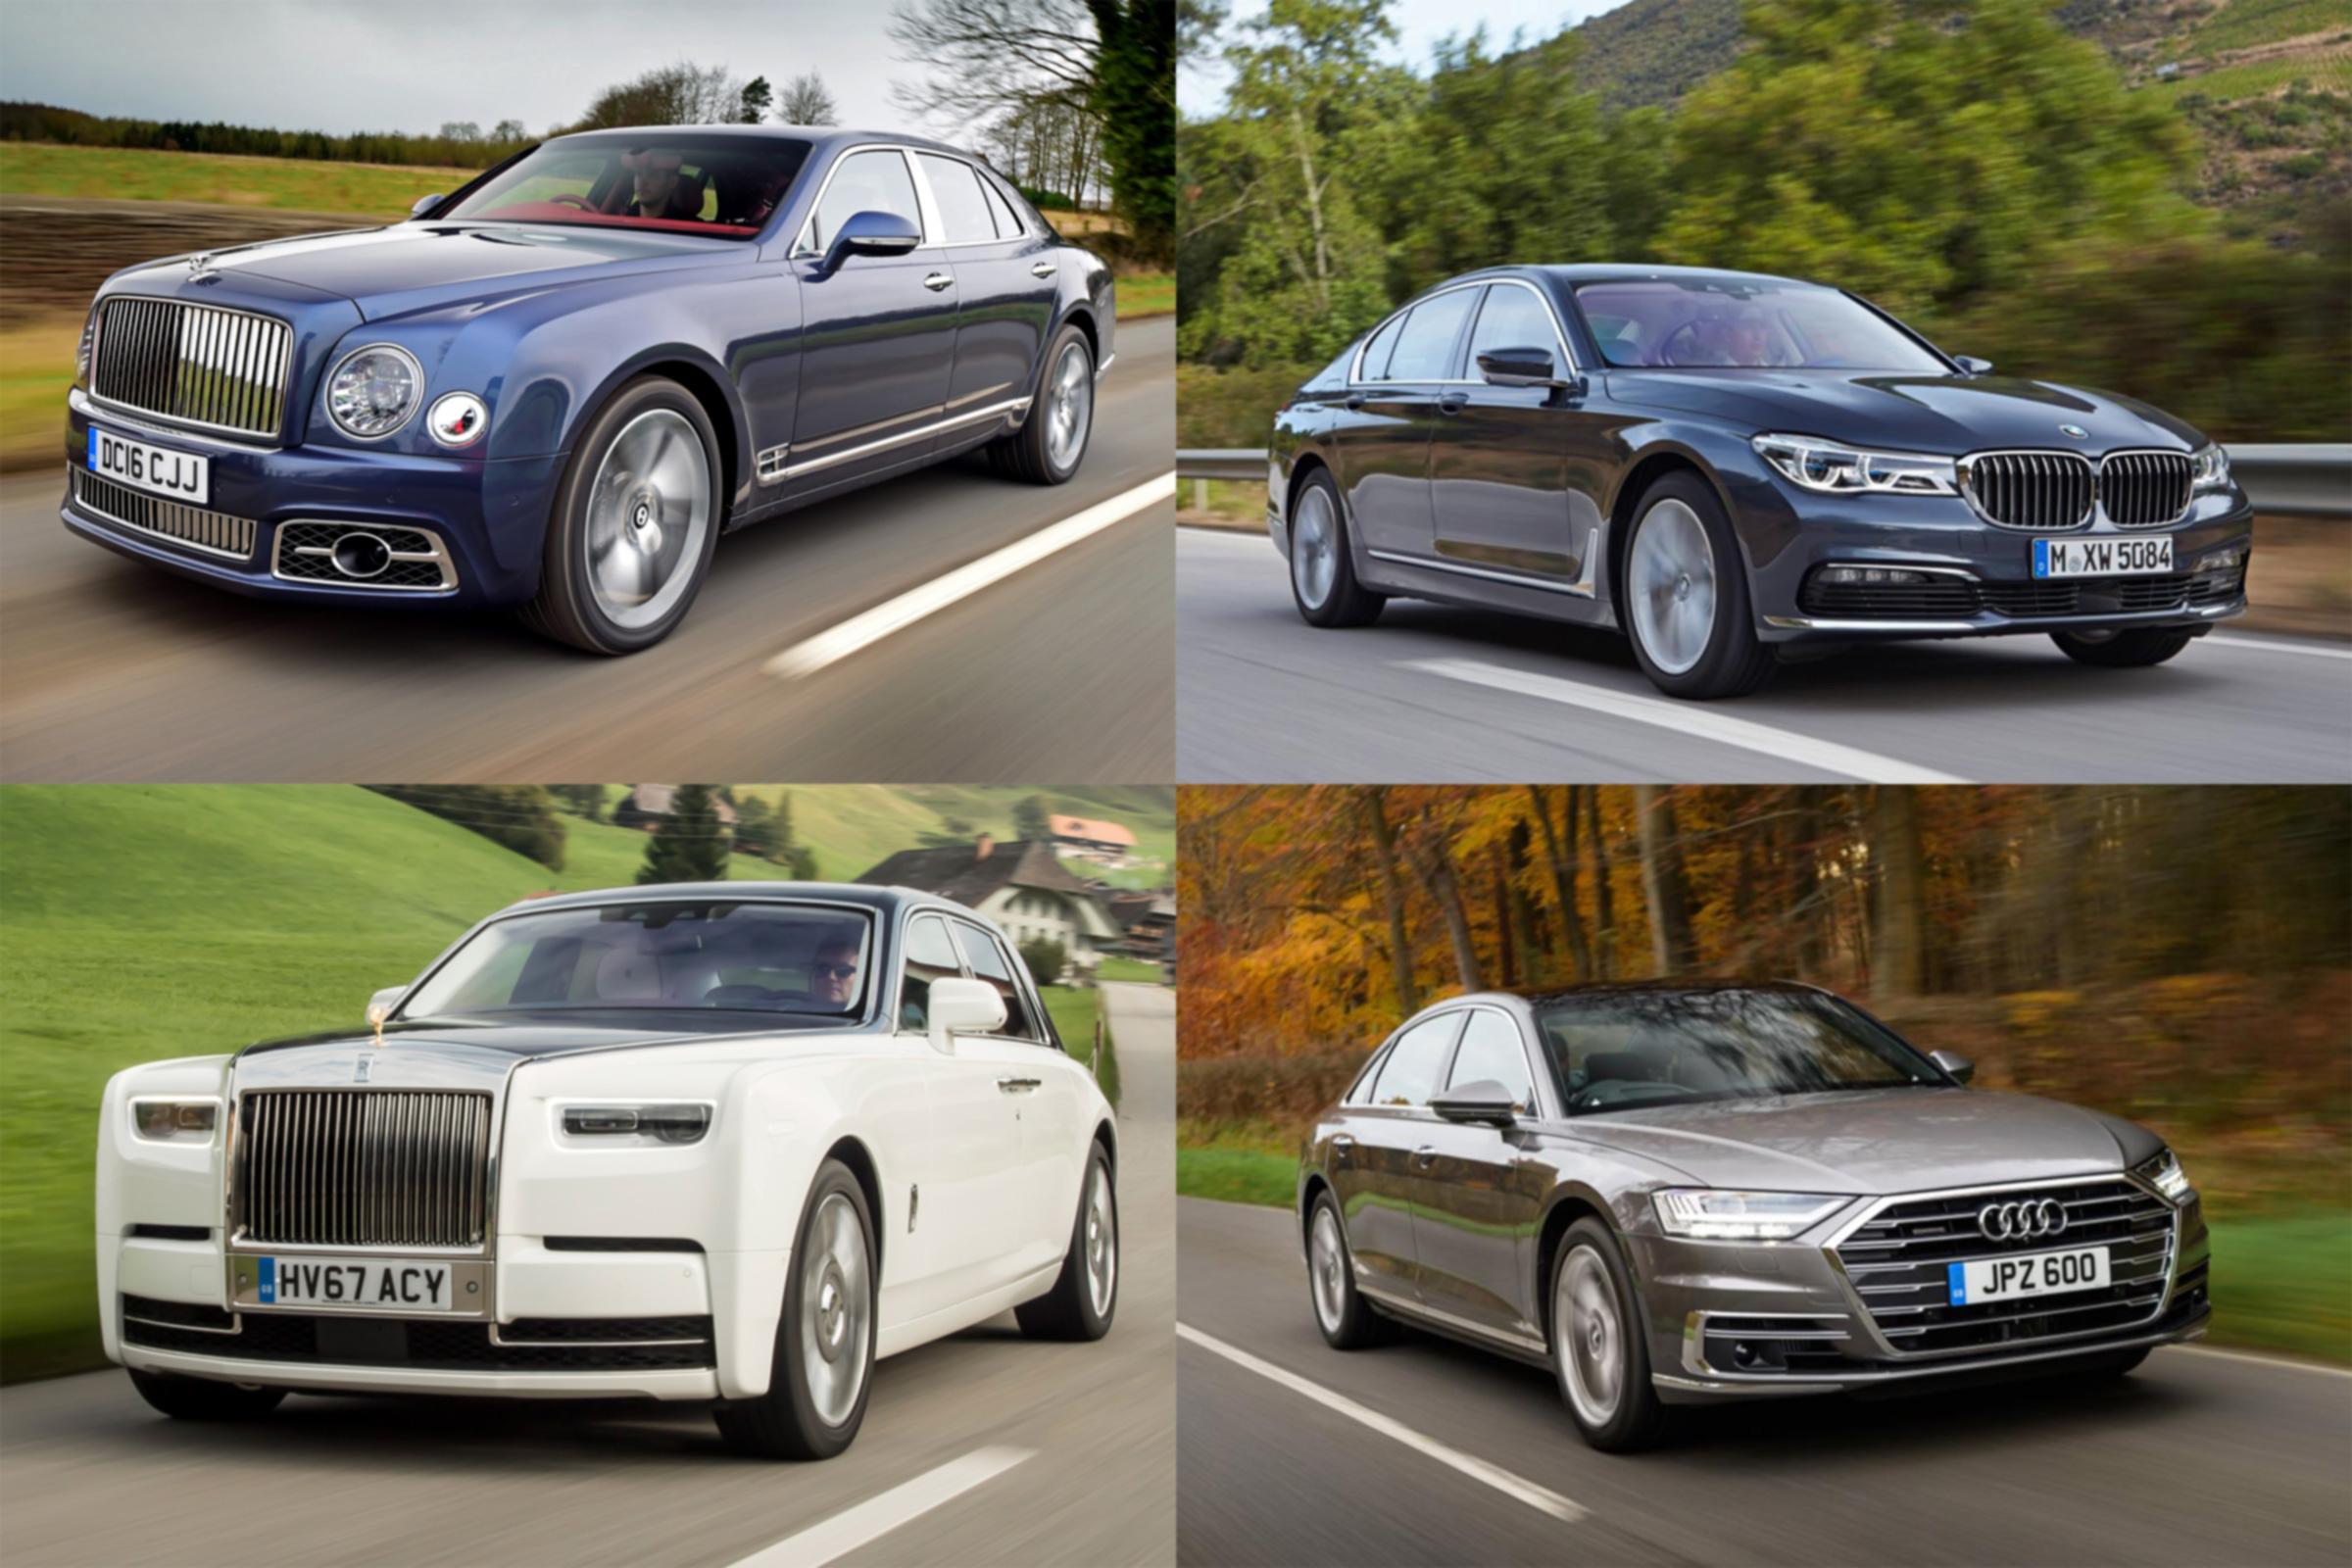 Luxurious car photo